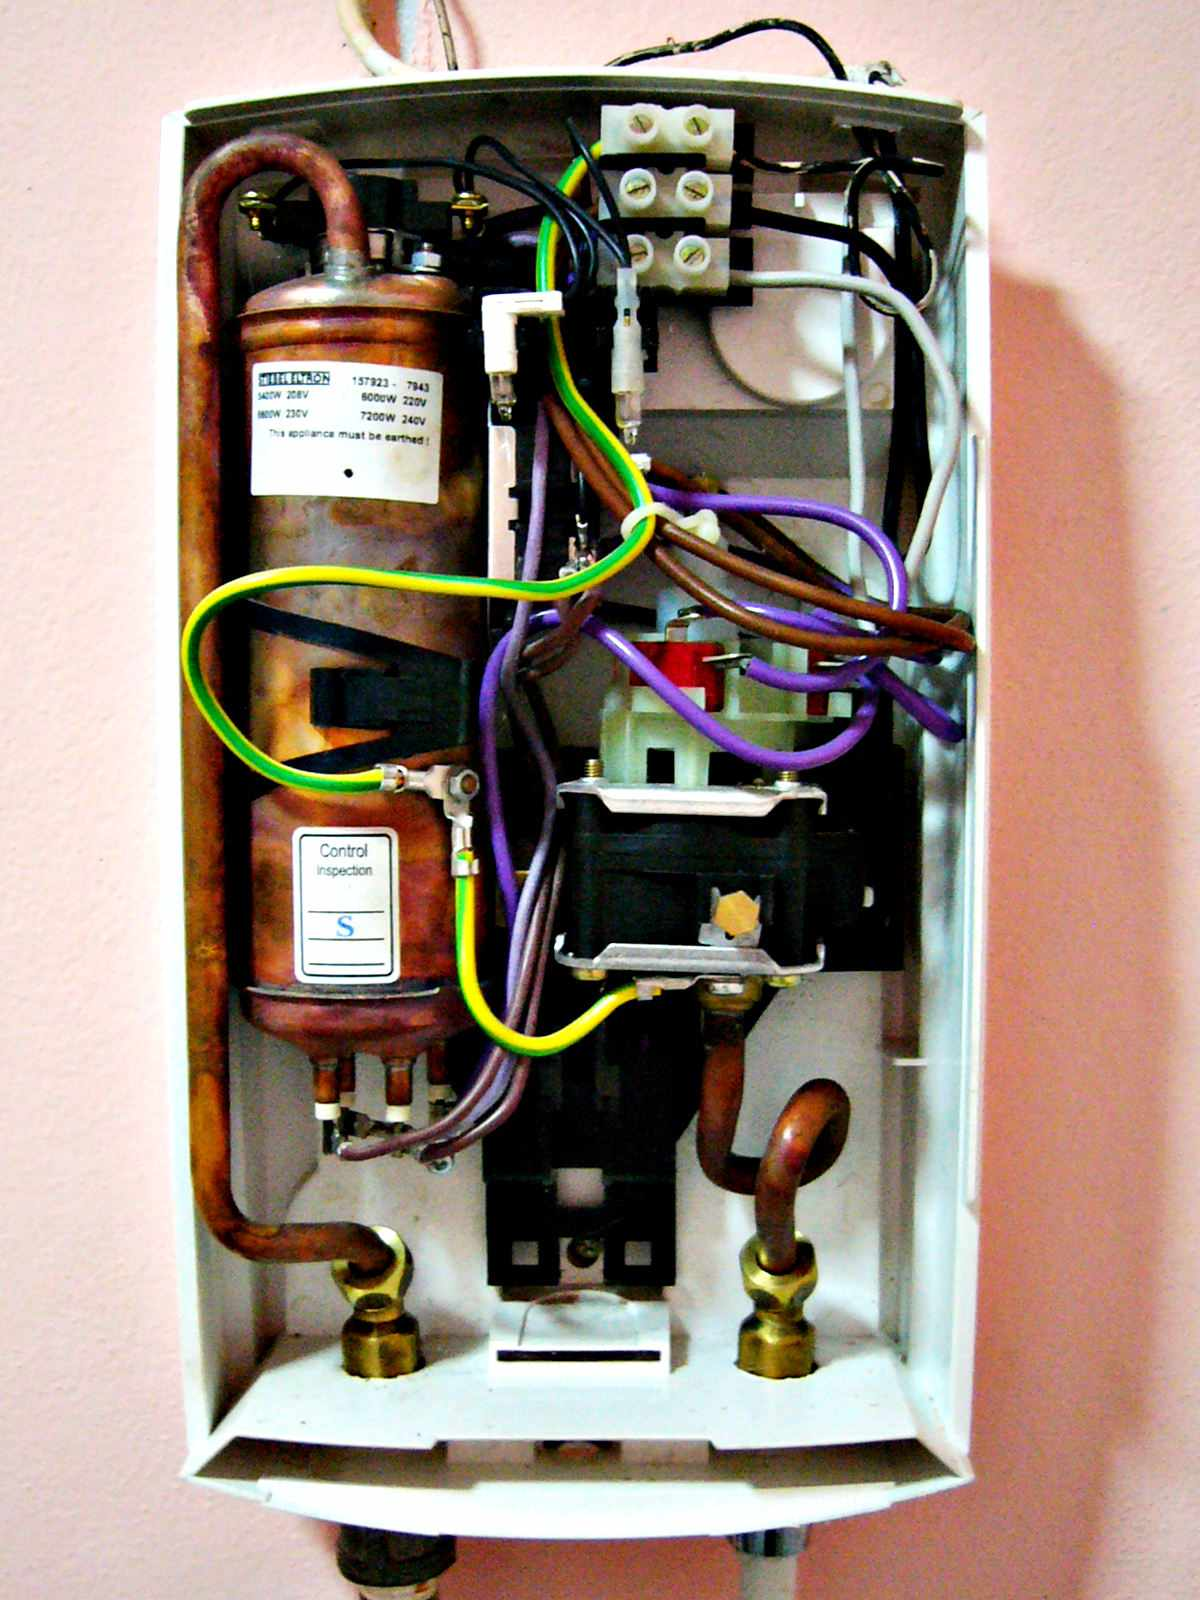 Arreglo de problemas de un calentador de agua eléctrico